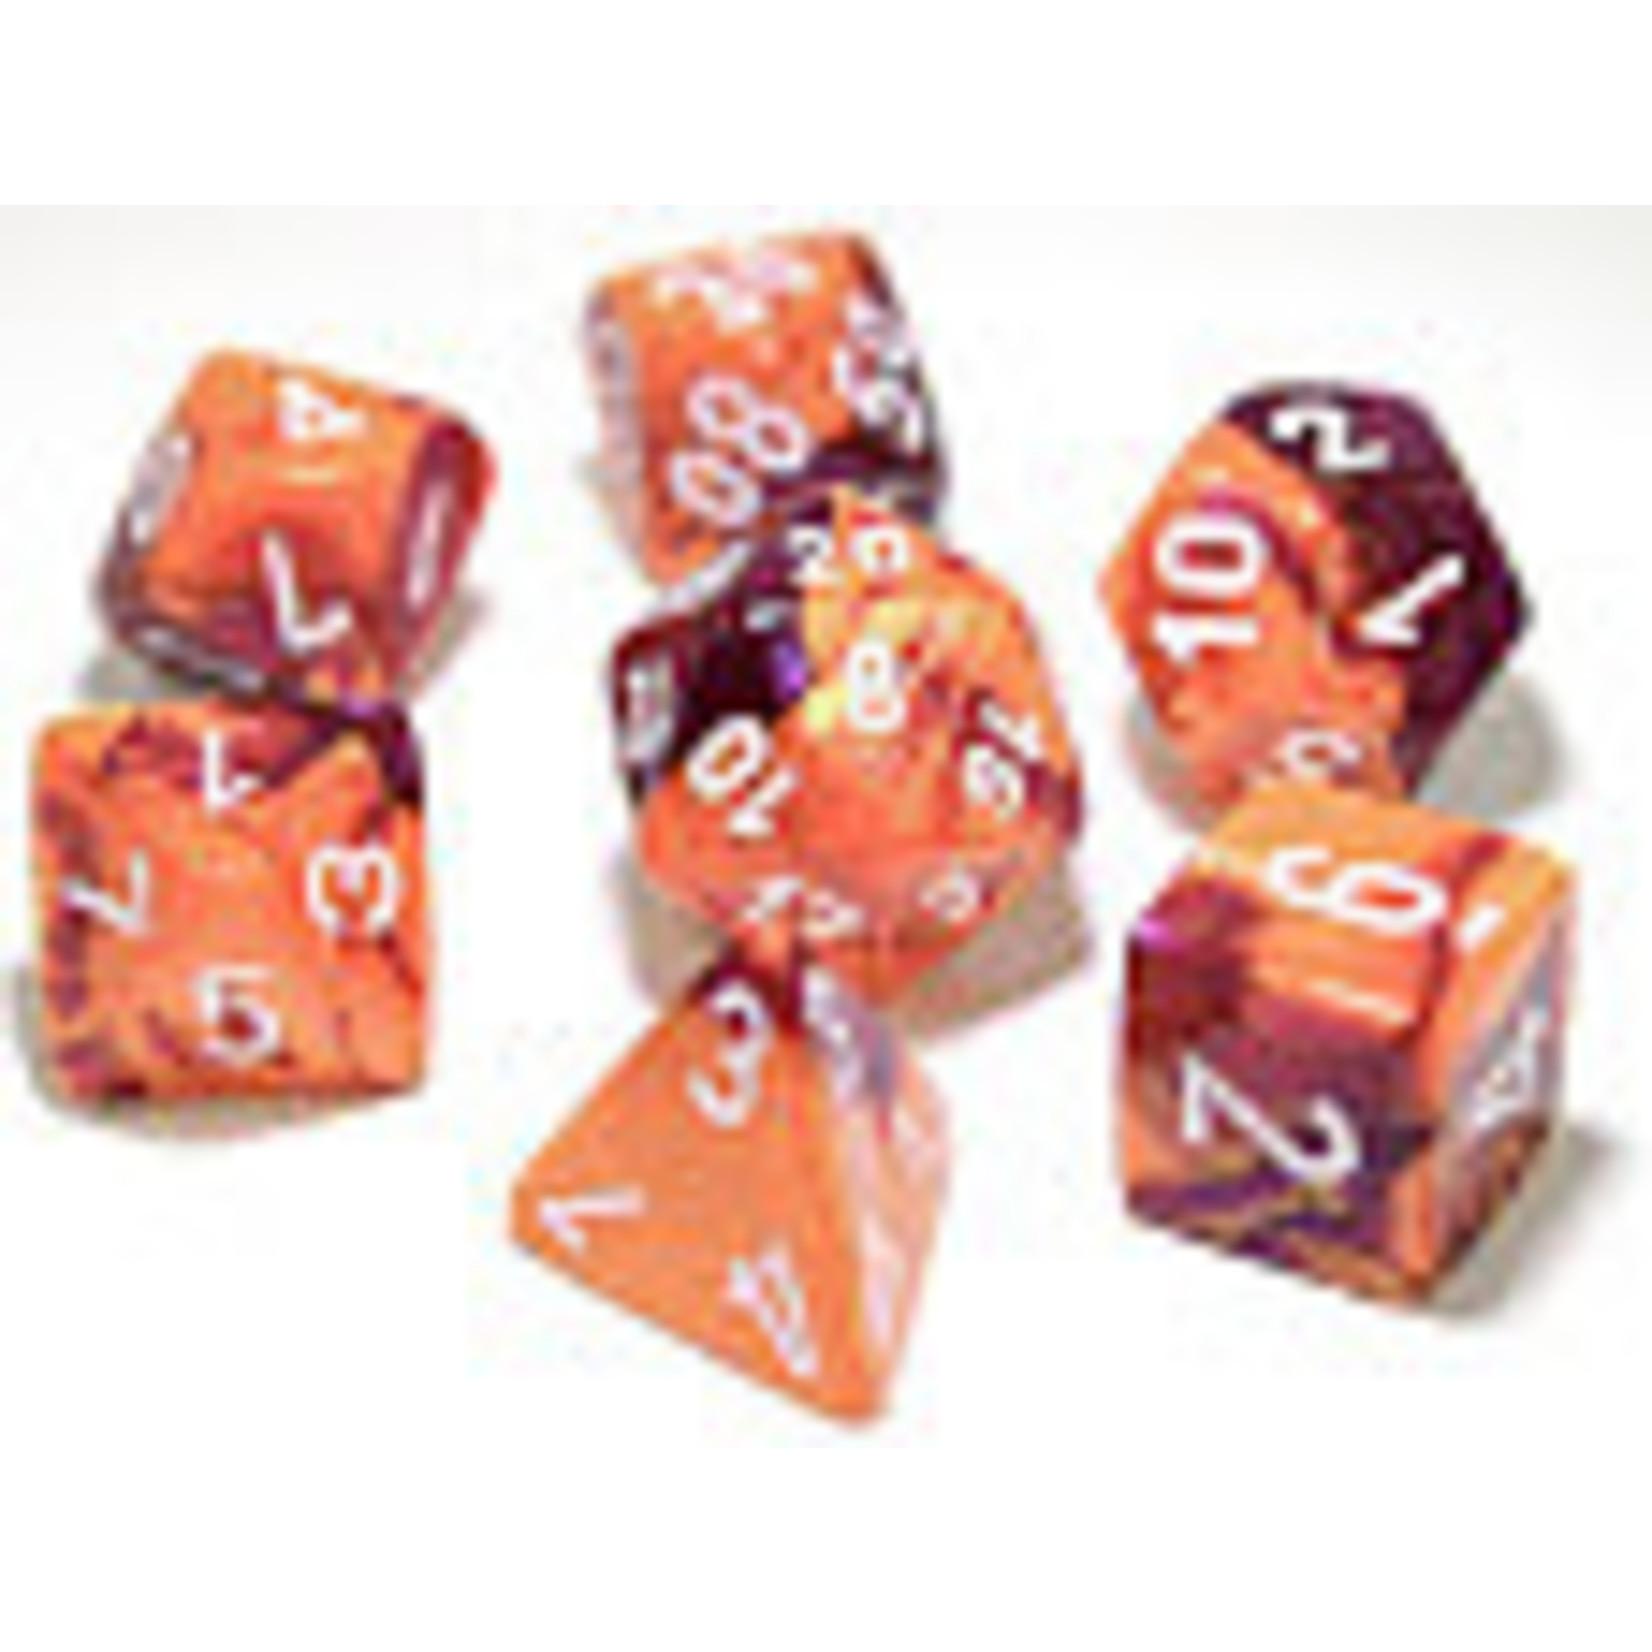 Chessex Chessex 7-Set Dice: Gemini - Orange/Purple/White 30021